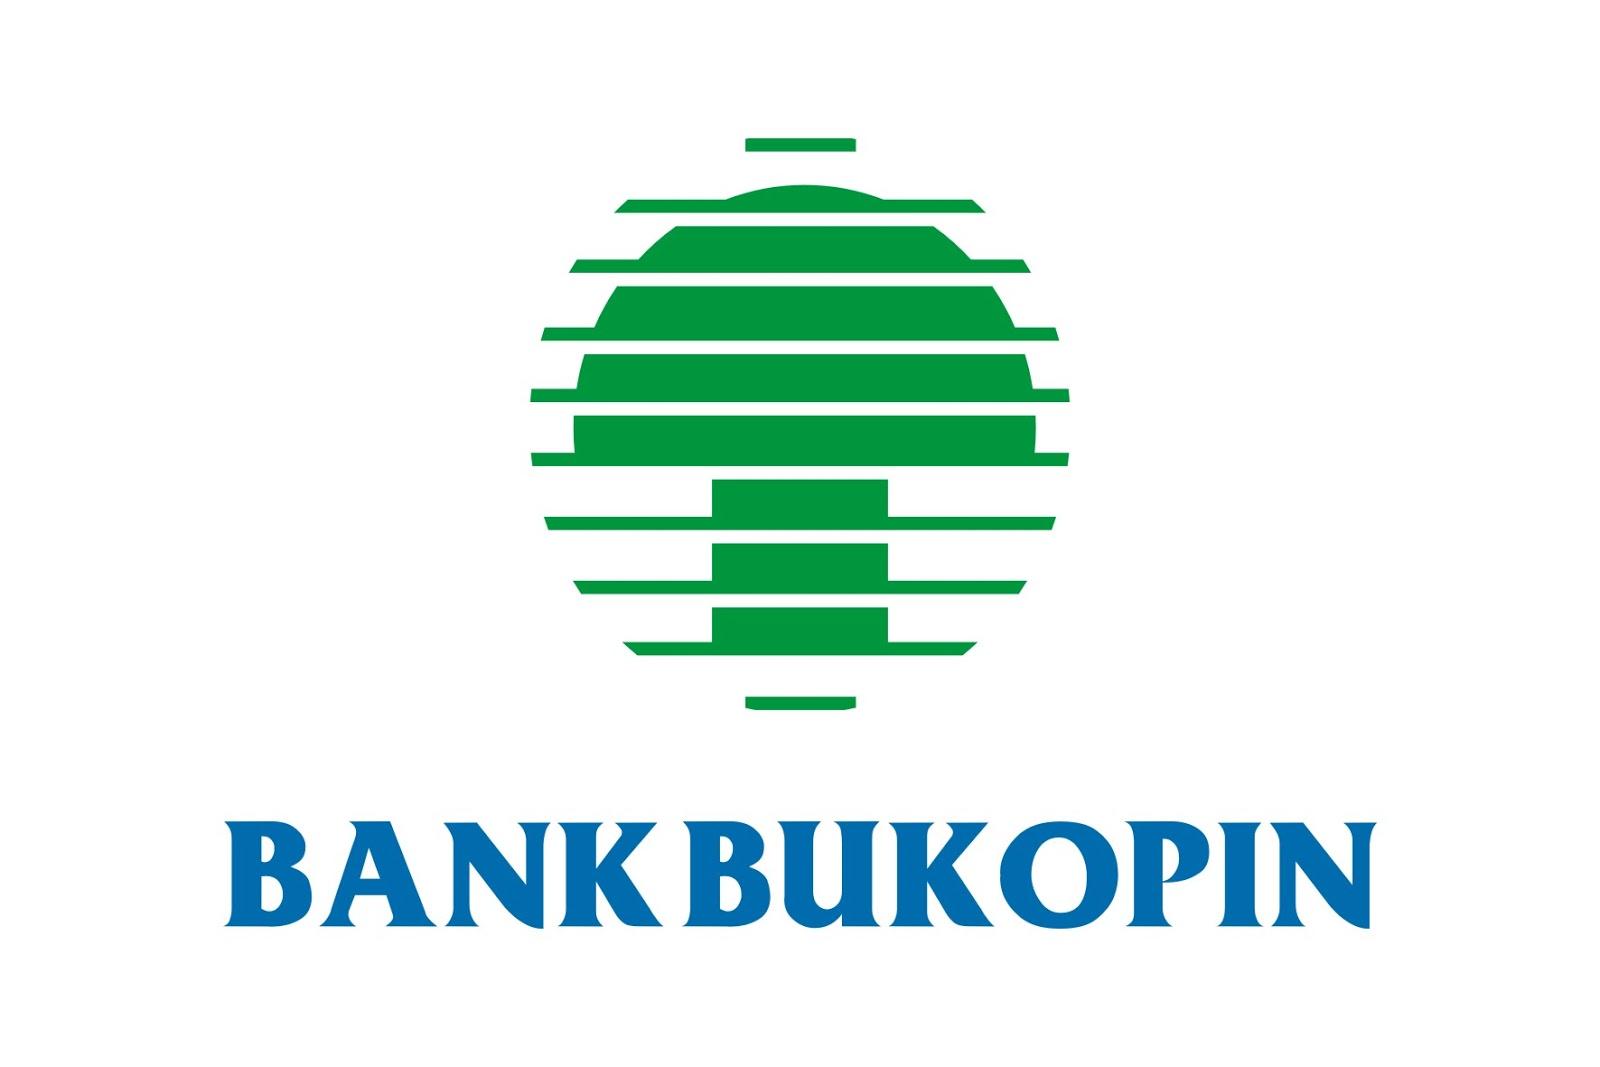 Bank Bukopin Tbk Logo photo - 1